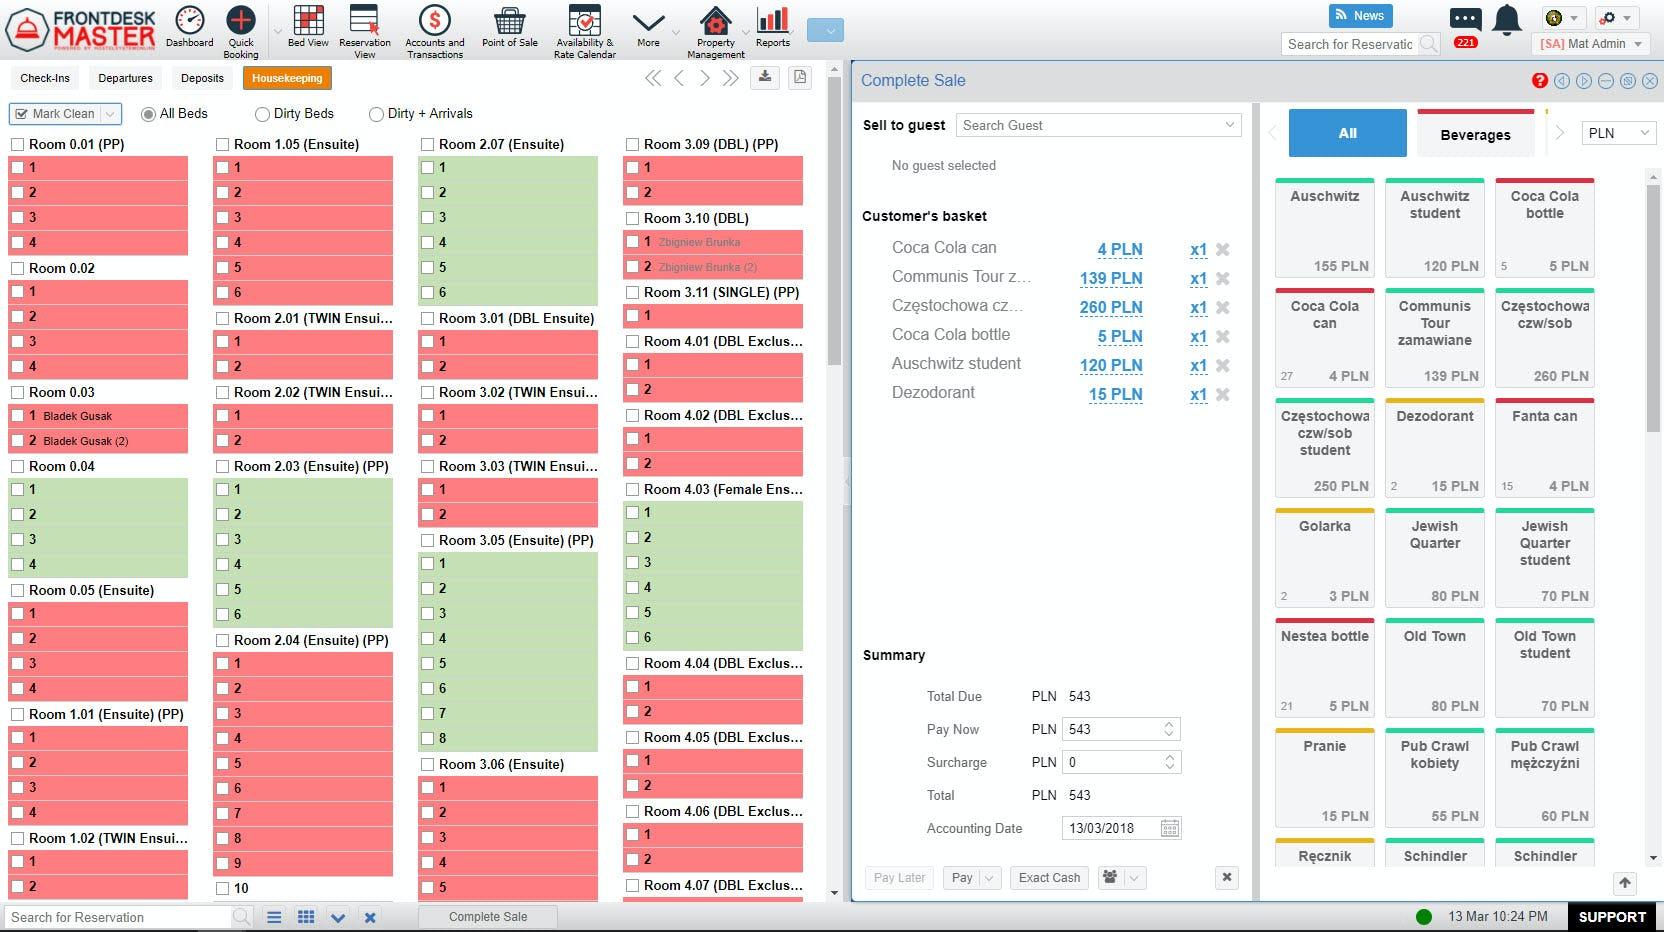 FrontDesk Master Software - Housekeeping